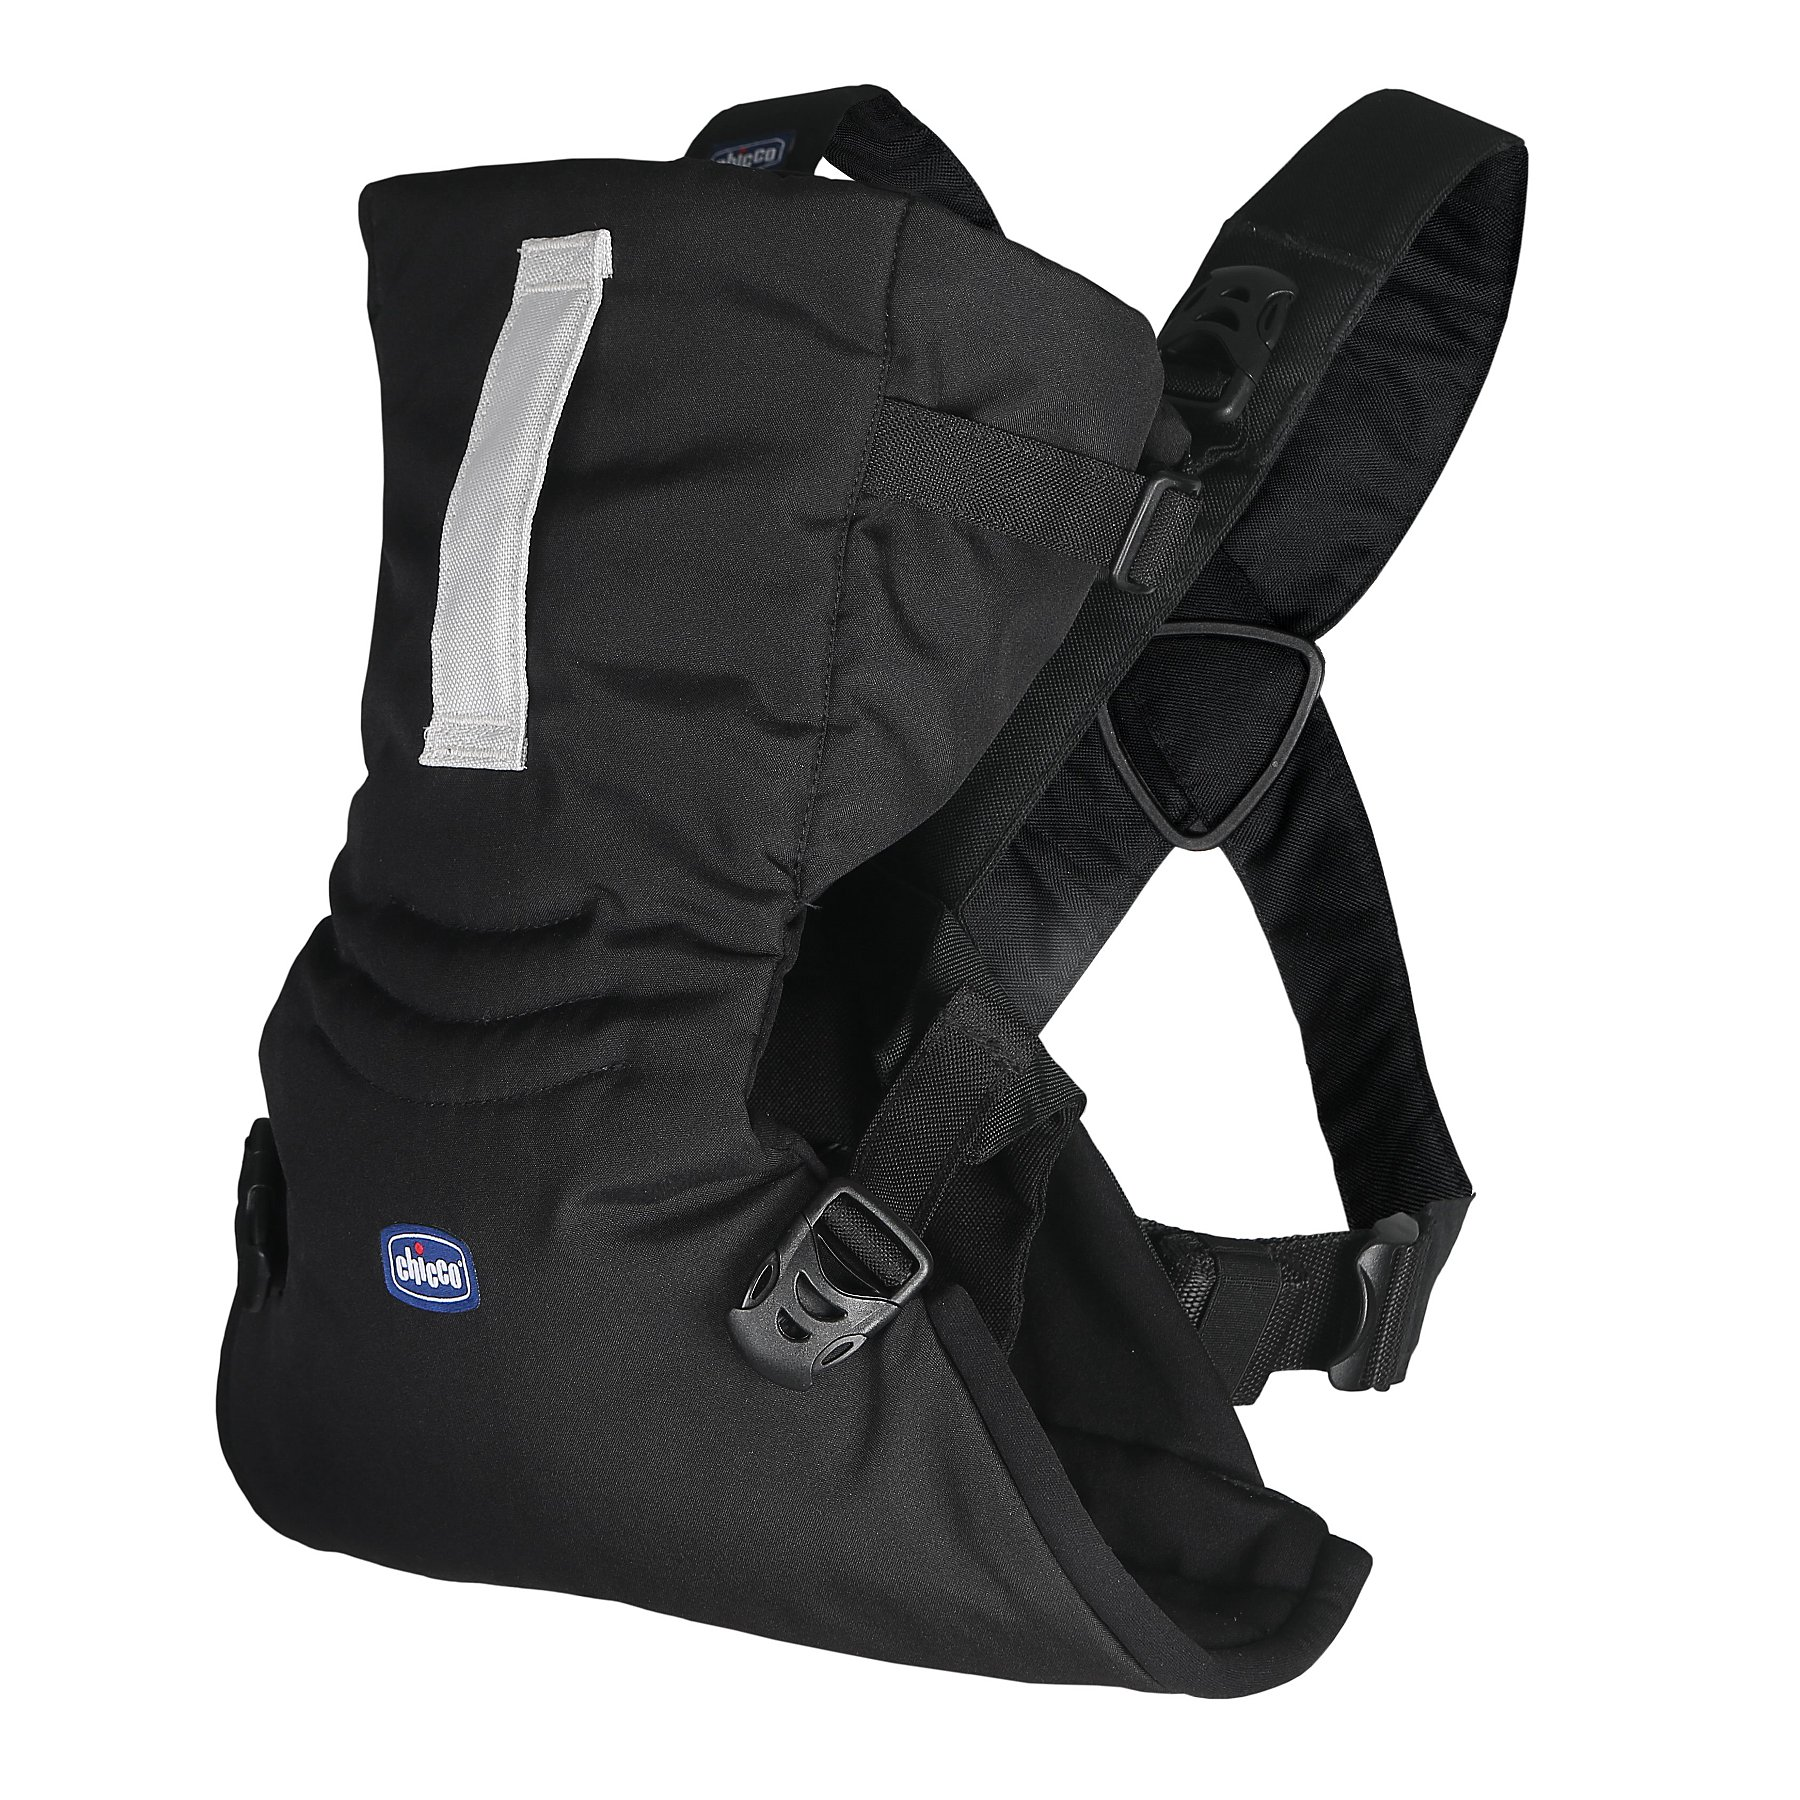 Chicco Easyfit Carrier